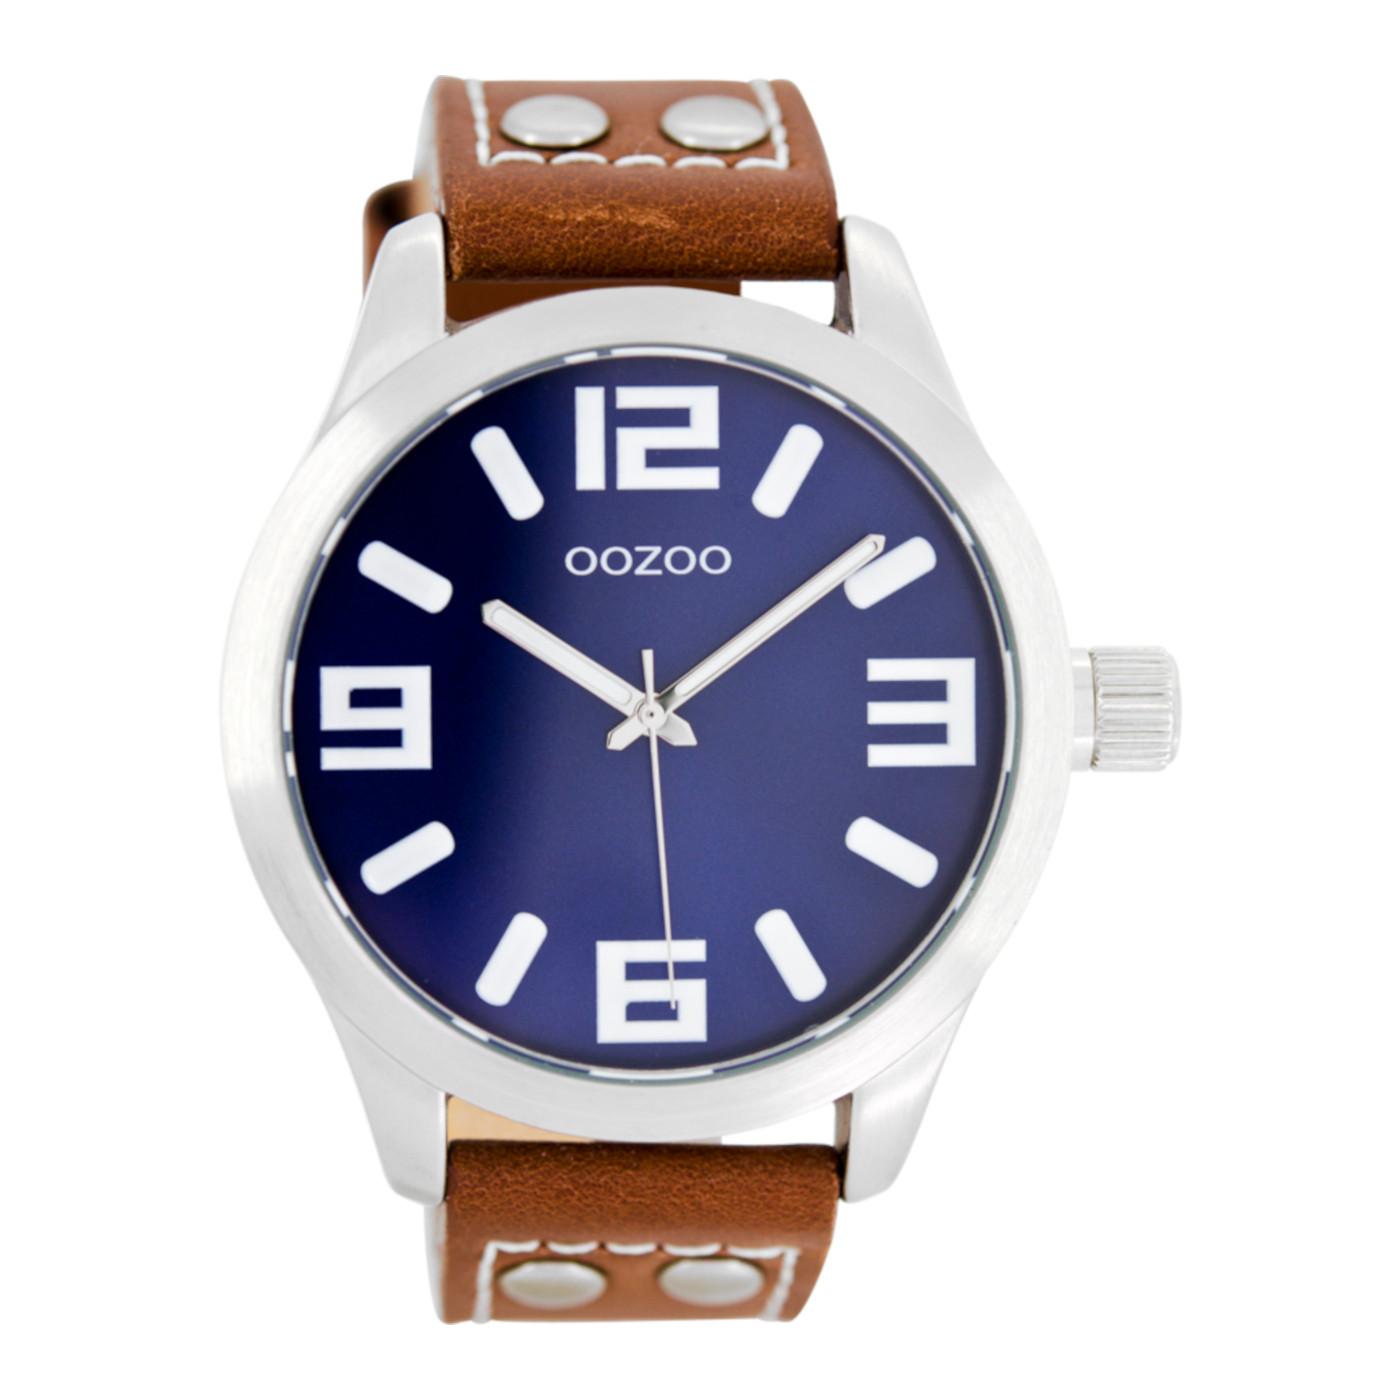 OOZOO Timepieces Bruin/Blauw horloge C1065 (46 mm)